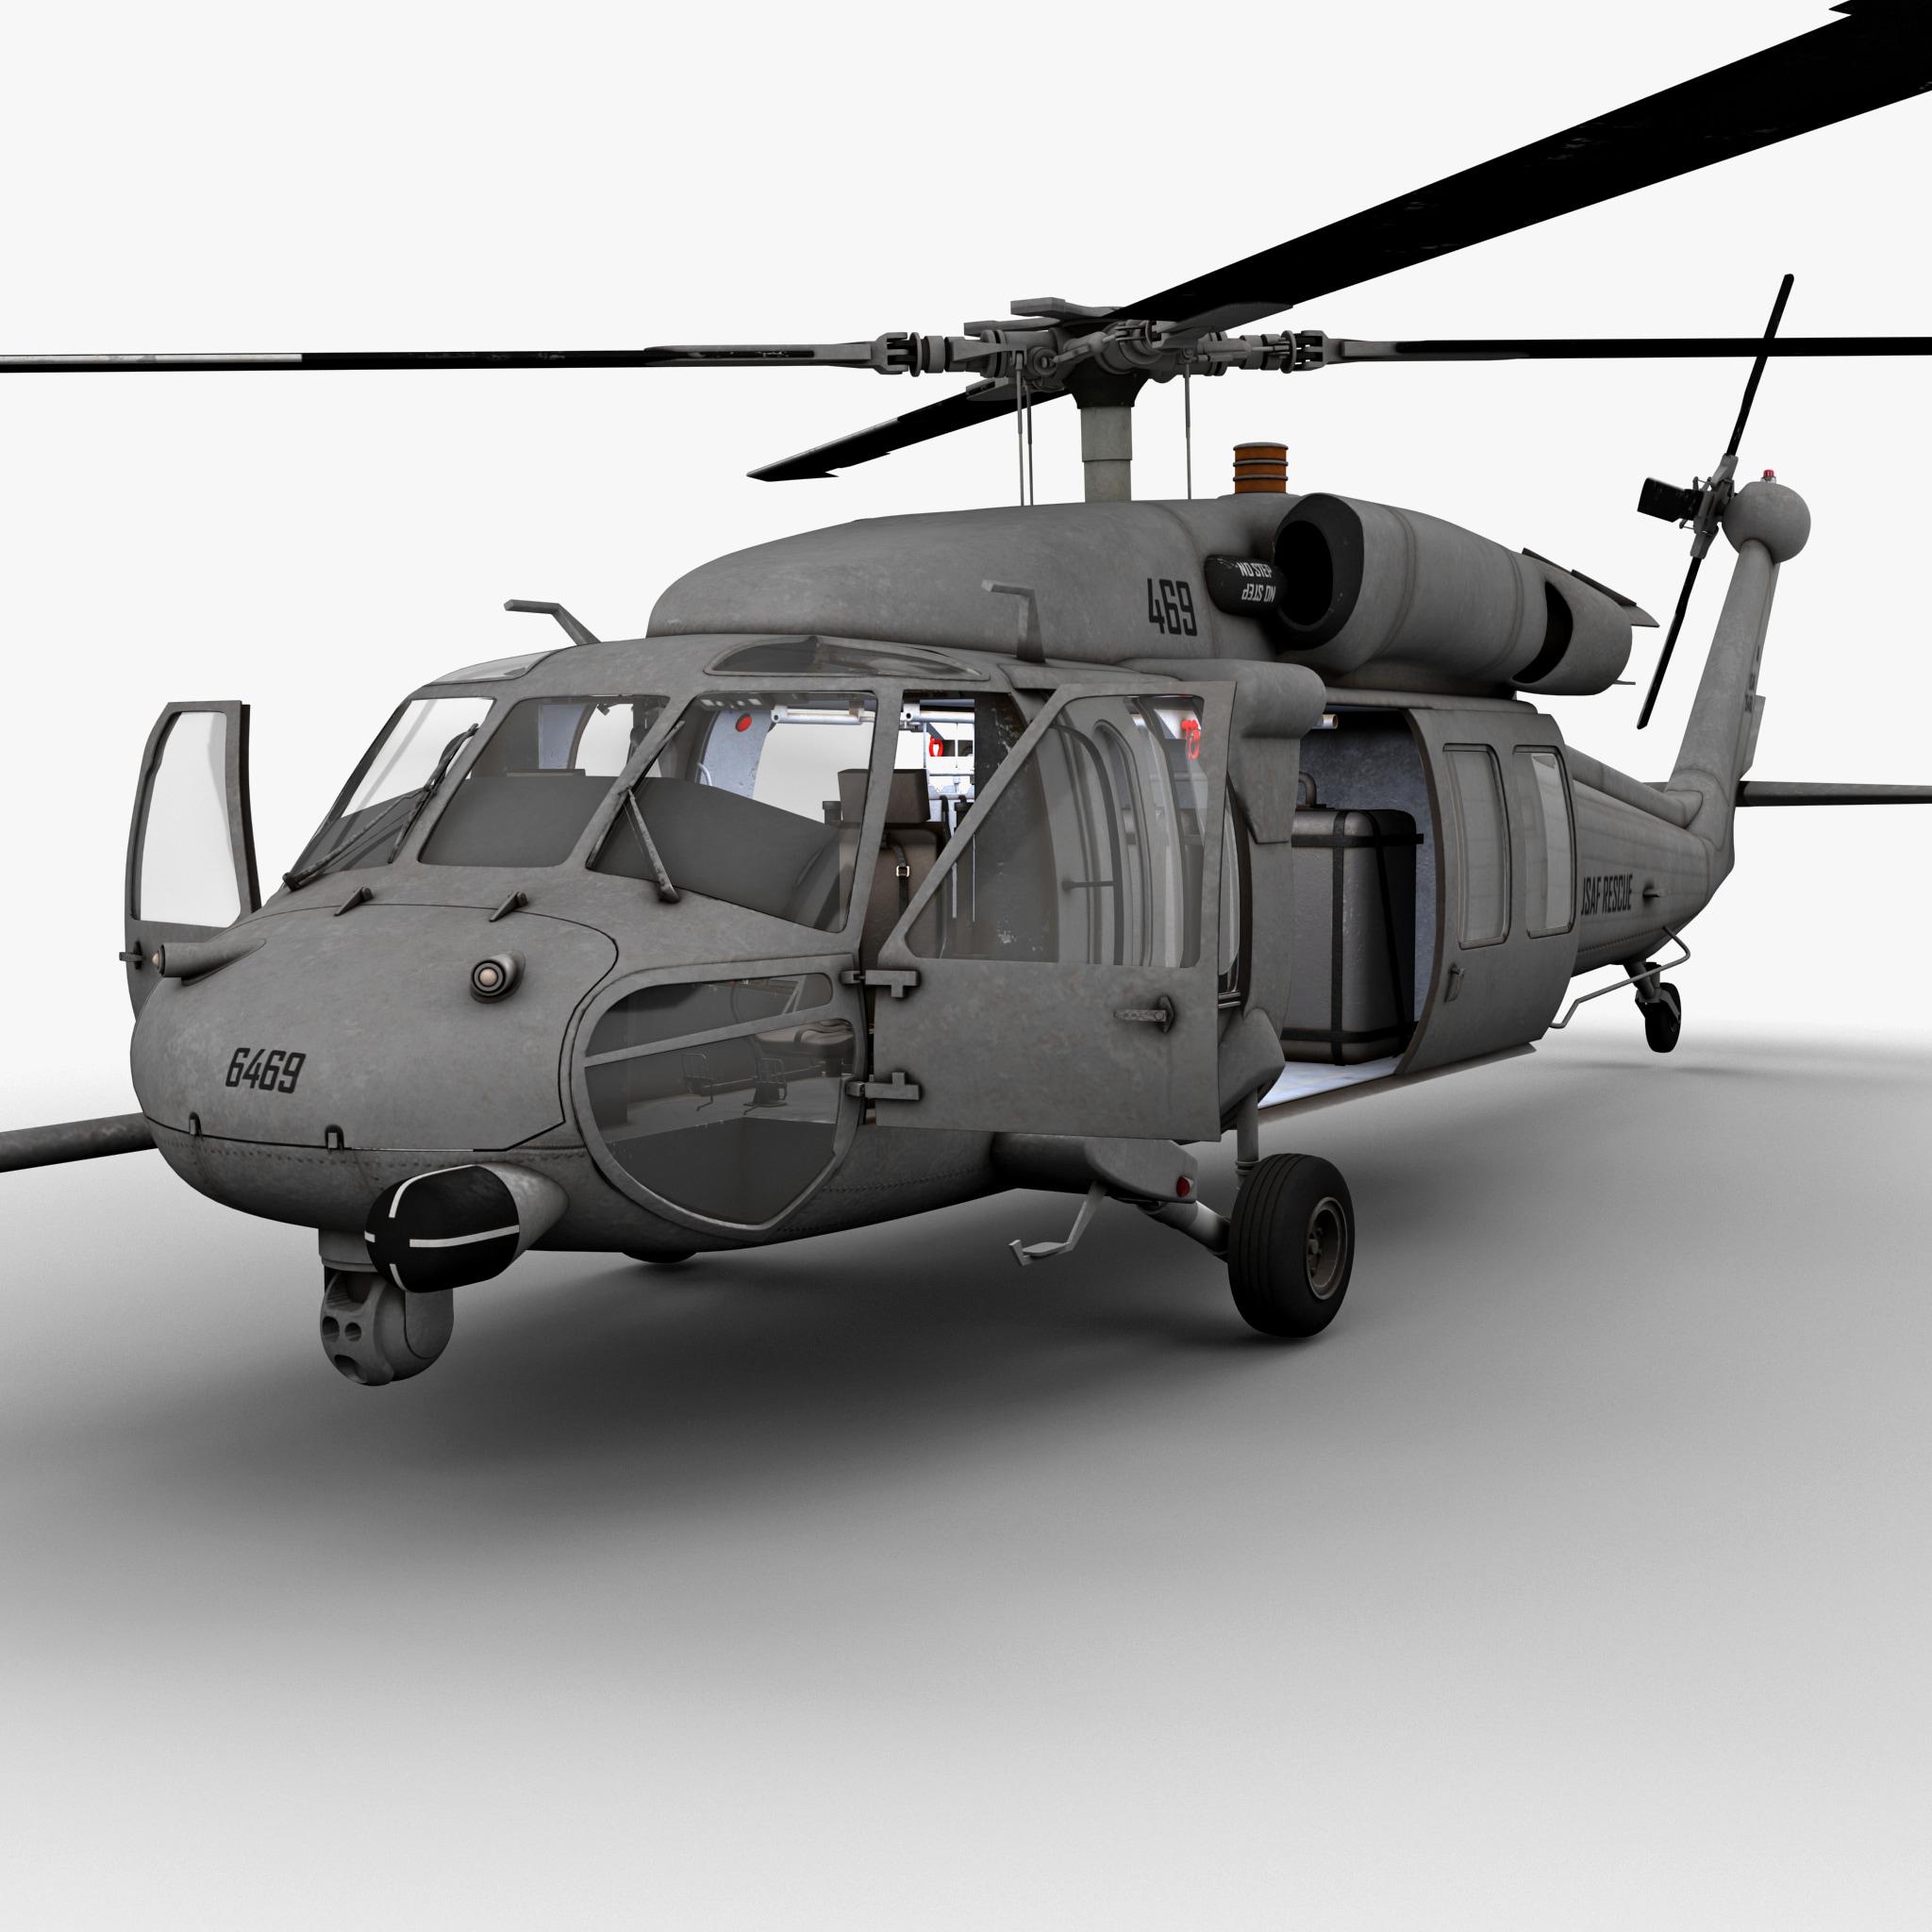 HH-60 Pave Hawk_2.jpg